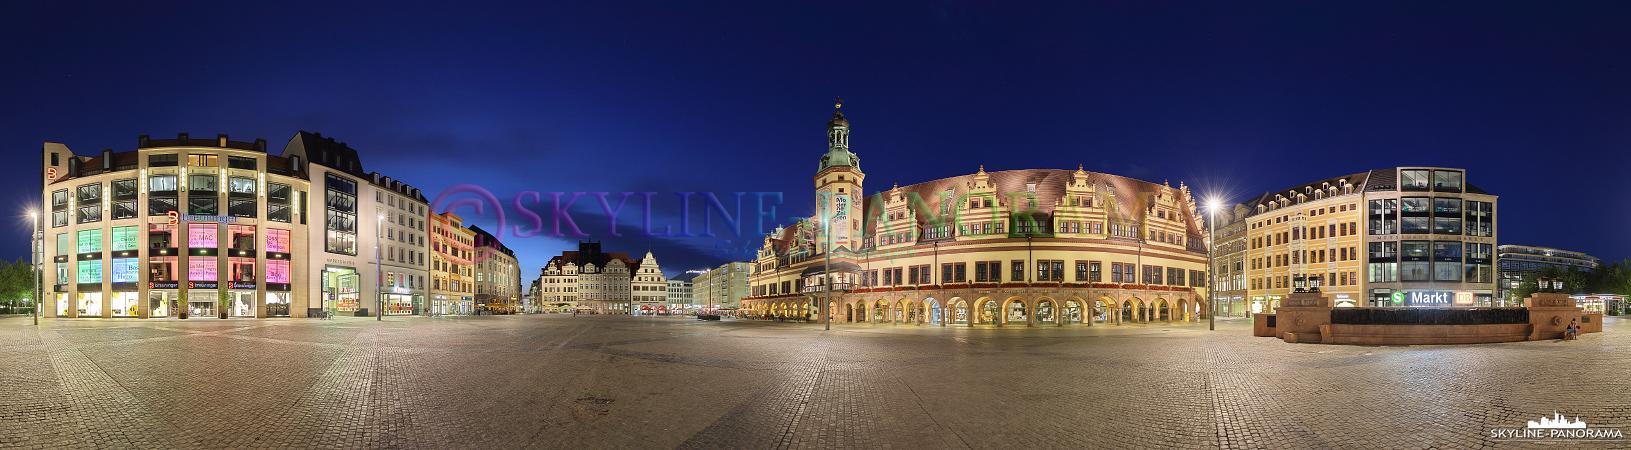 Leipziger Markt Panorama